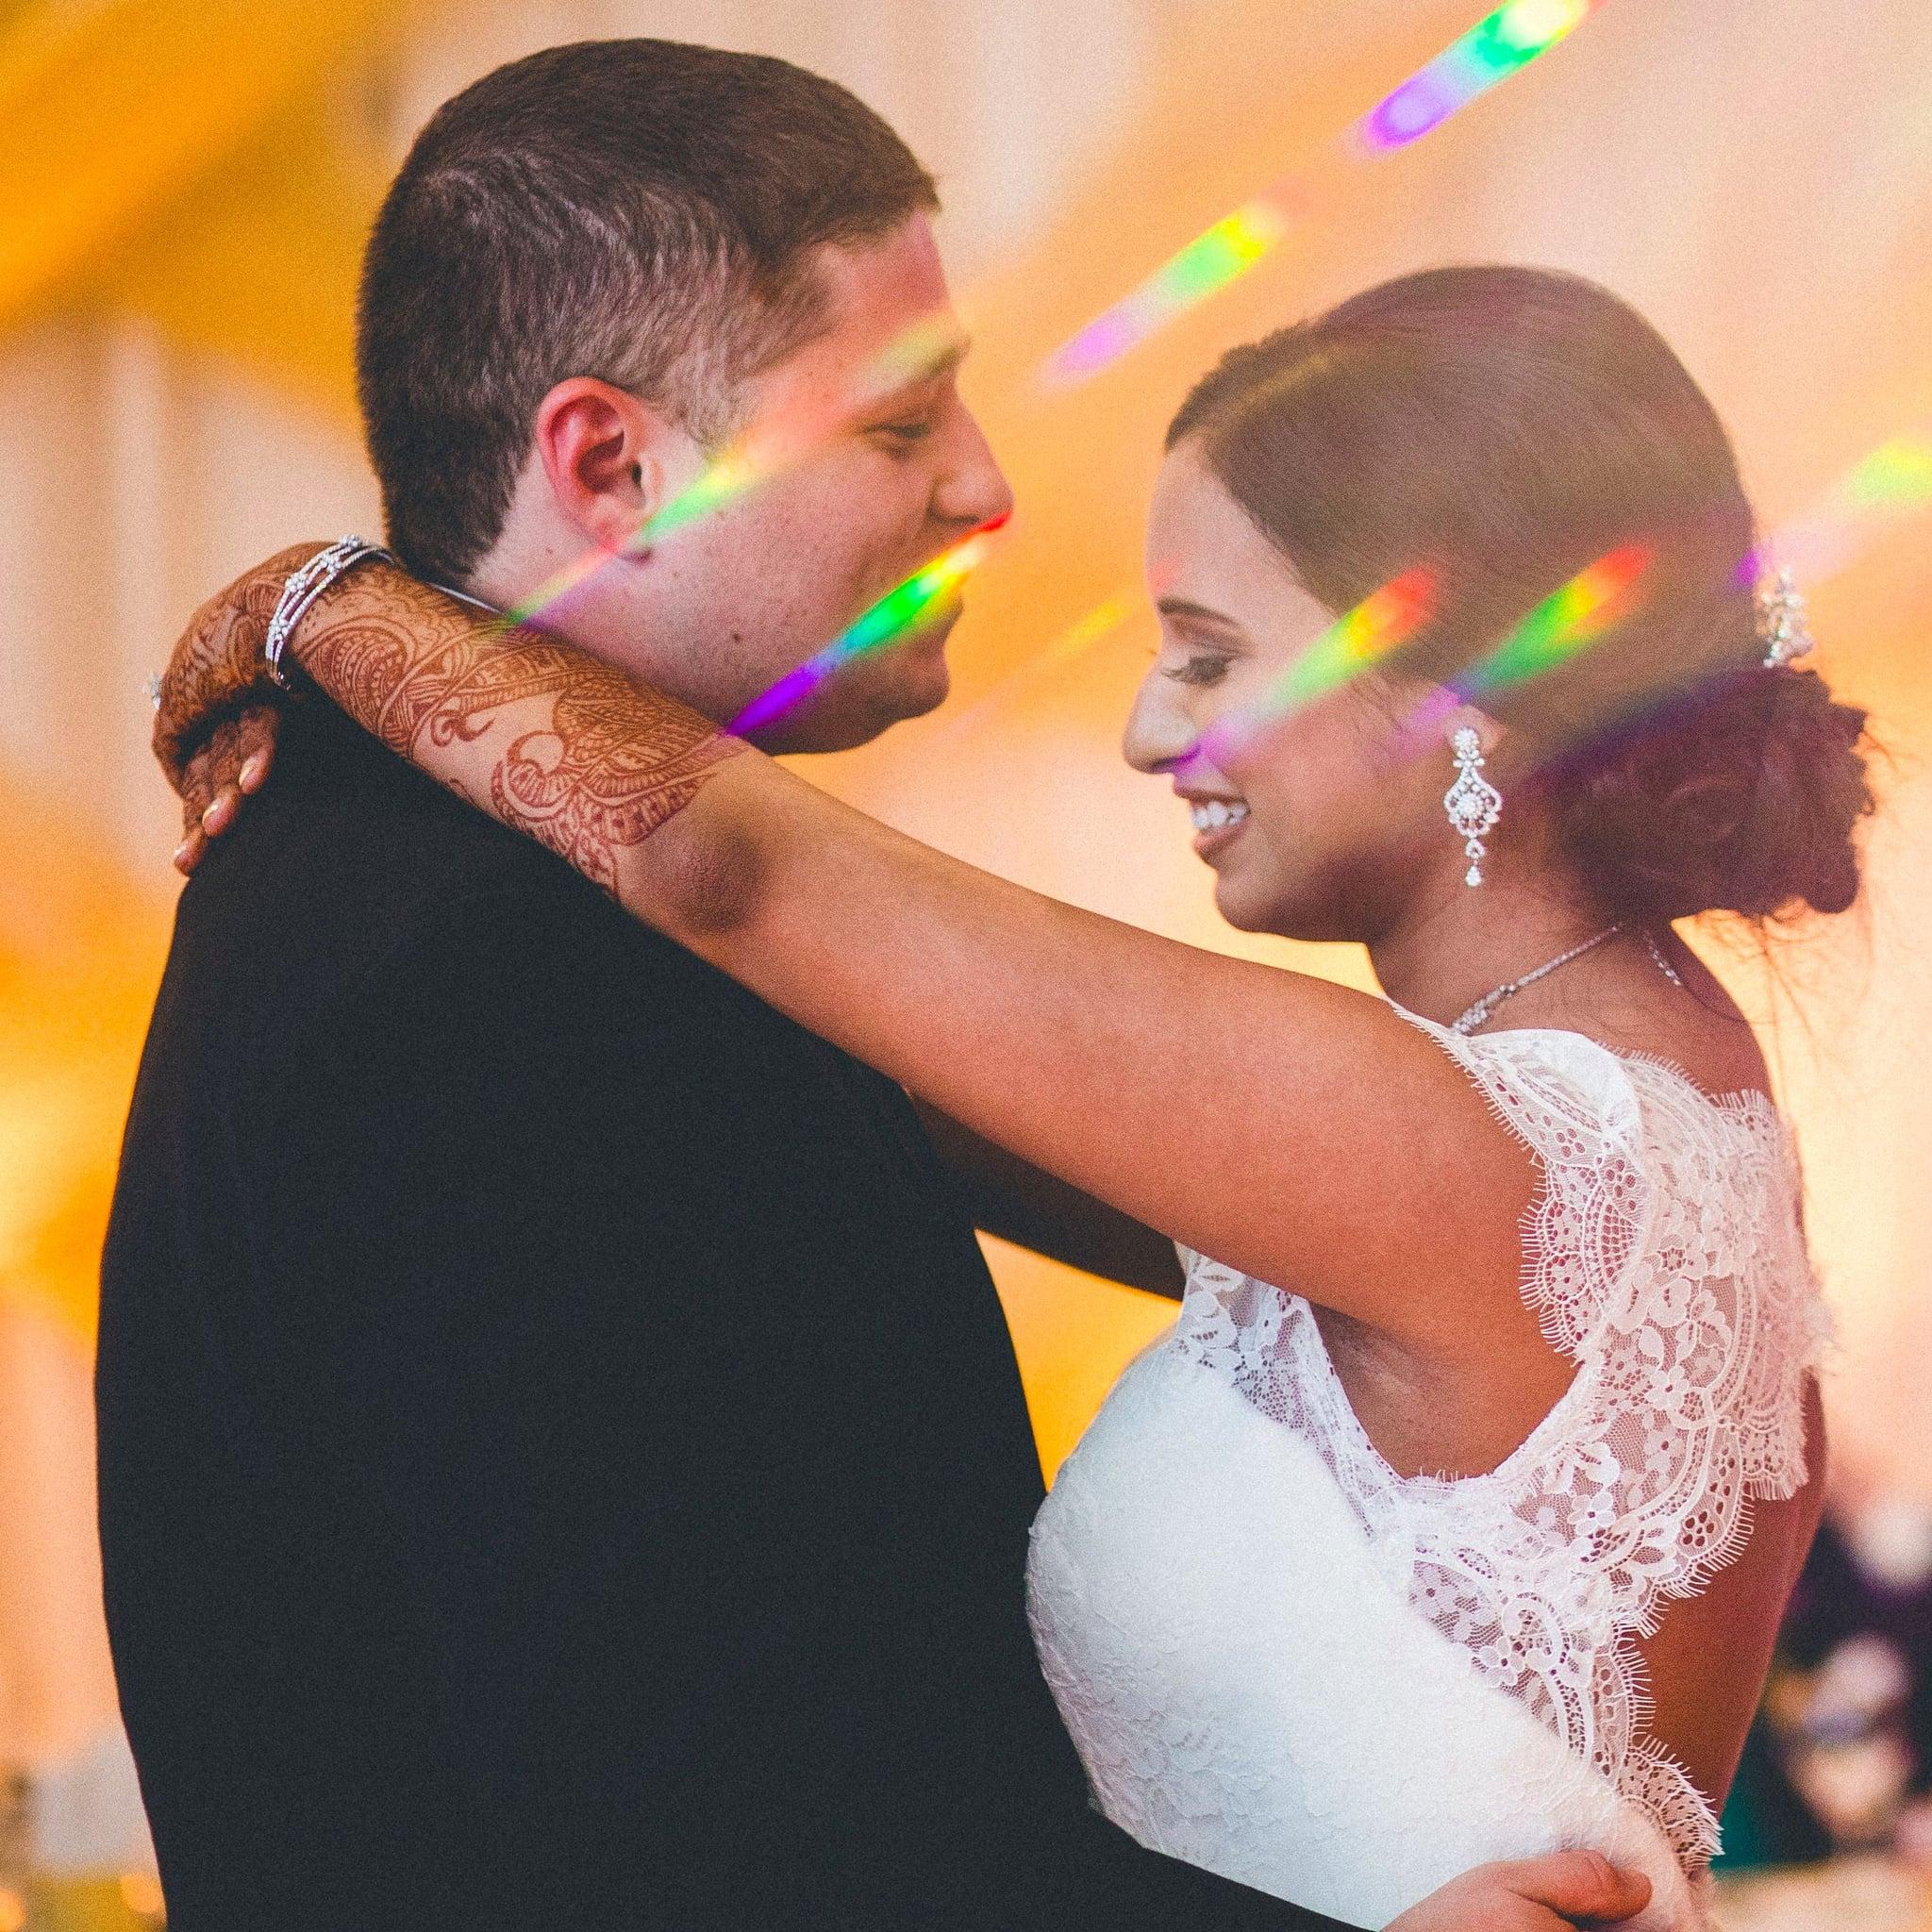 Wedding First-Dance Songs 2017 | POPSUGAR Entertainment